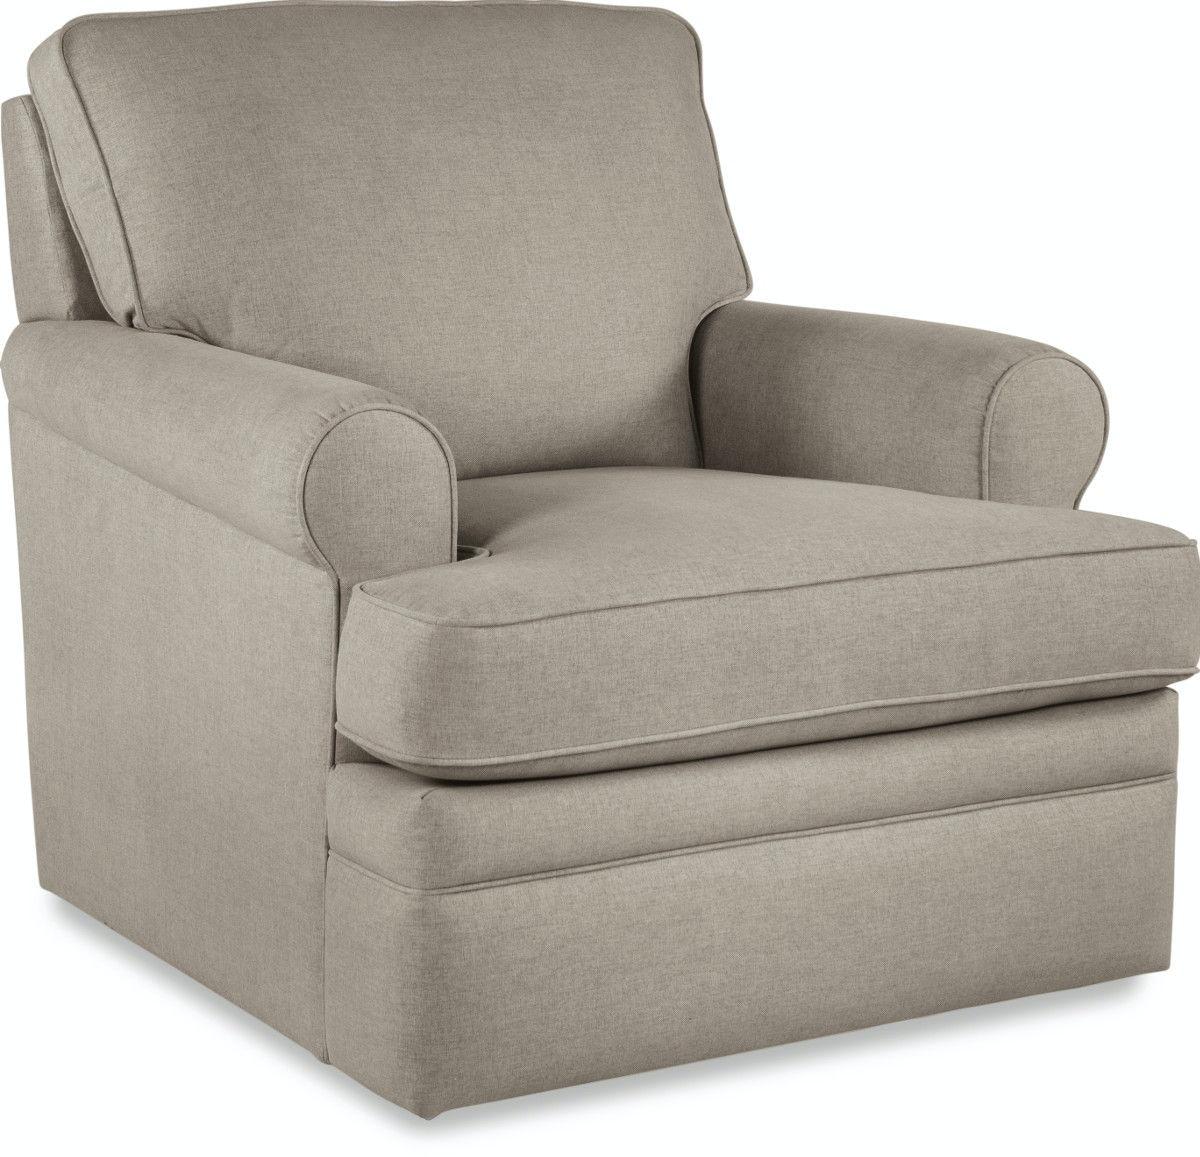 La-Z-Boy® Premier Swivel Occasional Chair 215462  sc 1 st  Union Furniture & Living Room La-Z-Boy® Premier Swivel Occasional Chair 215462 - Union ...